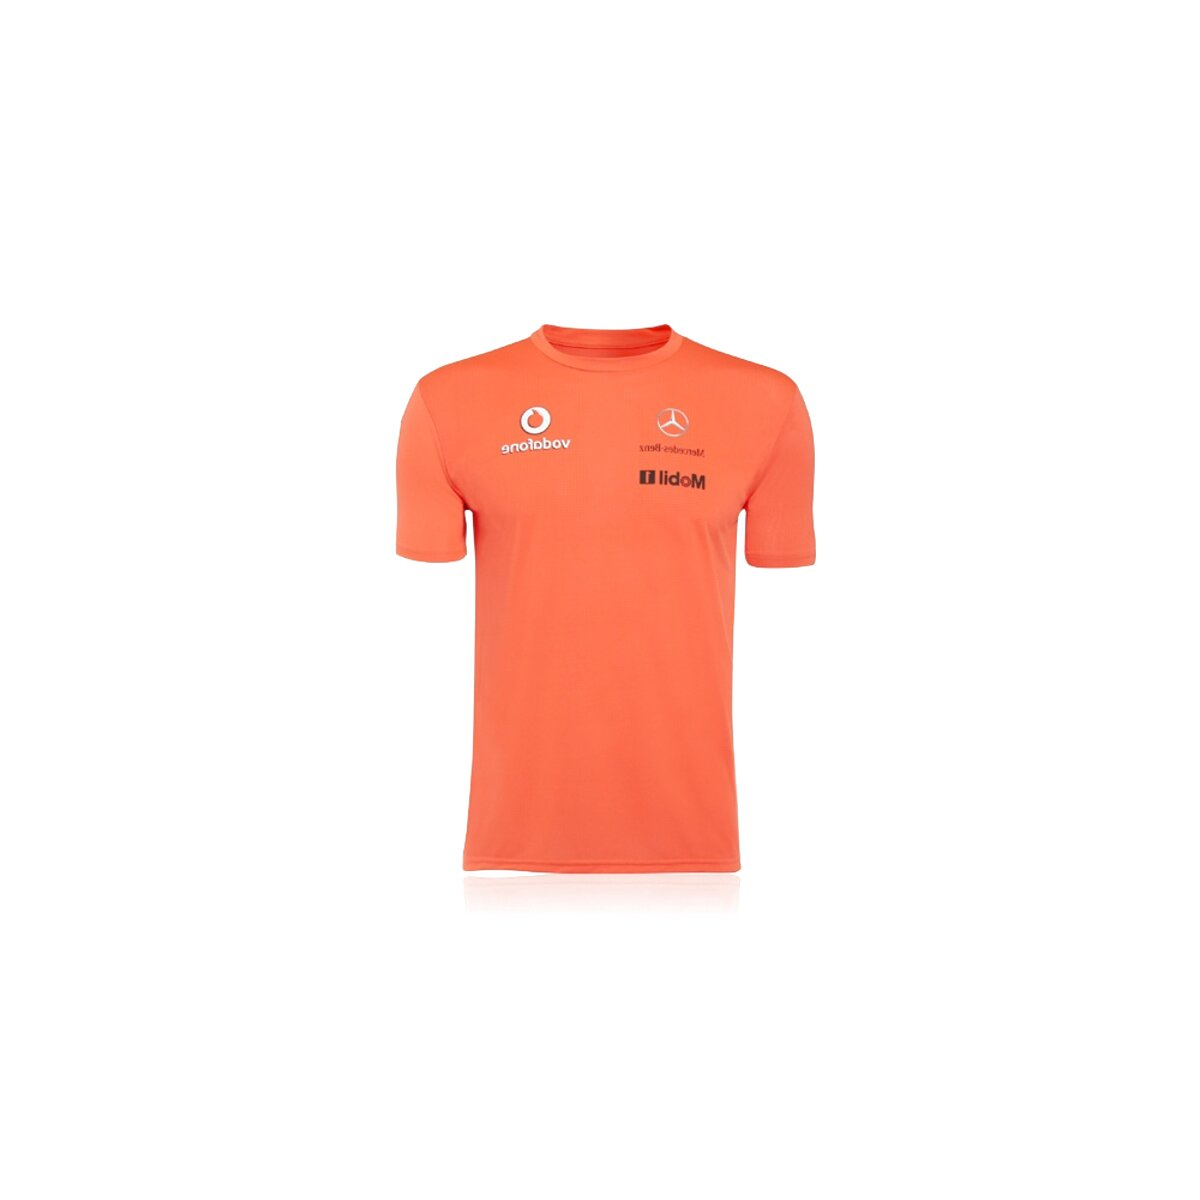 vodafone mclaren tshirt for sale